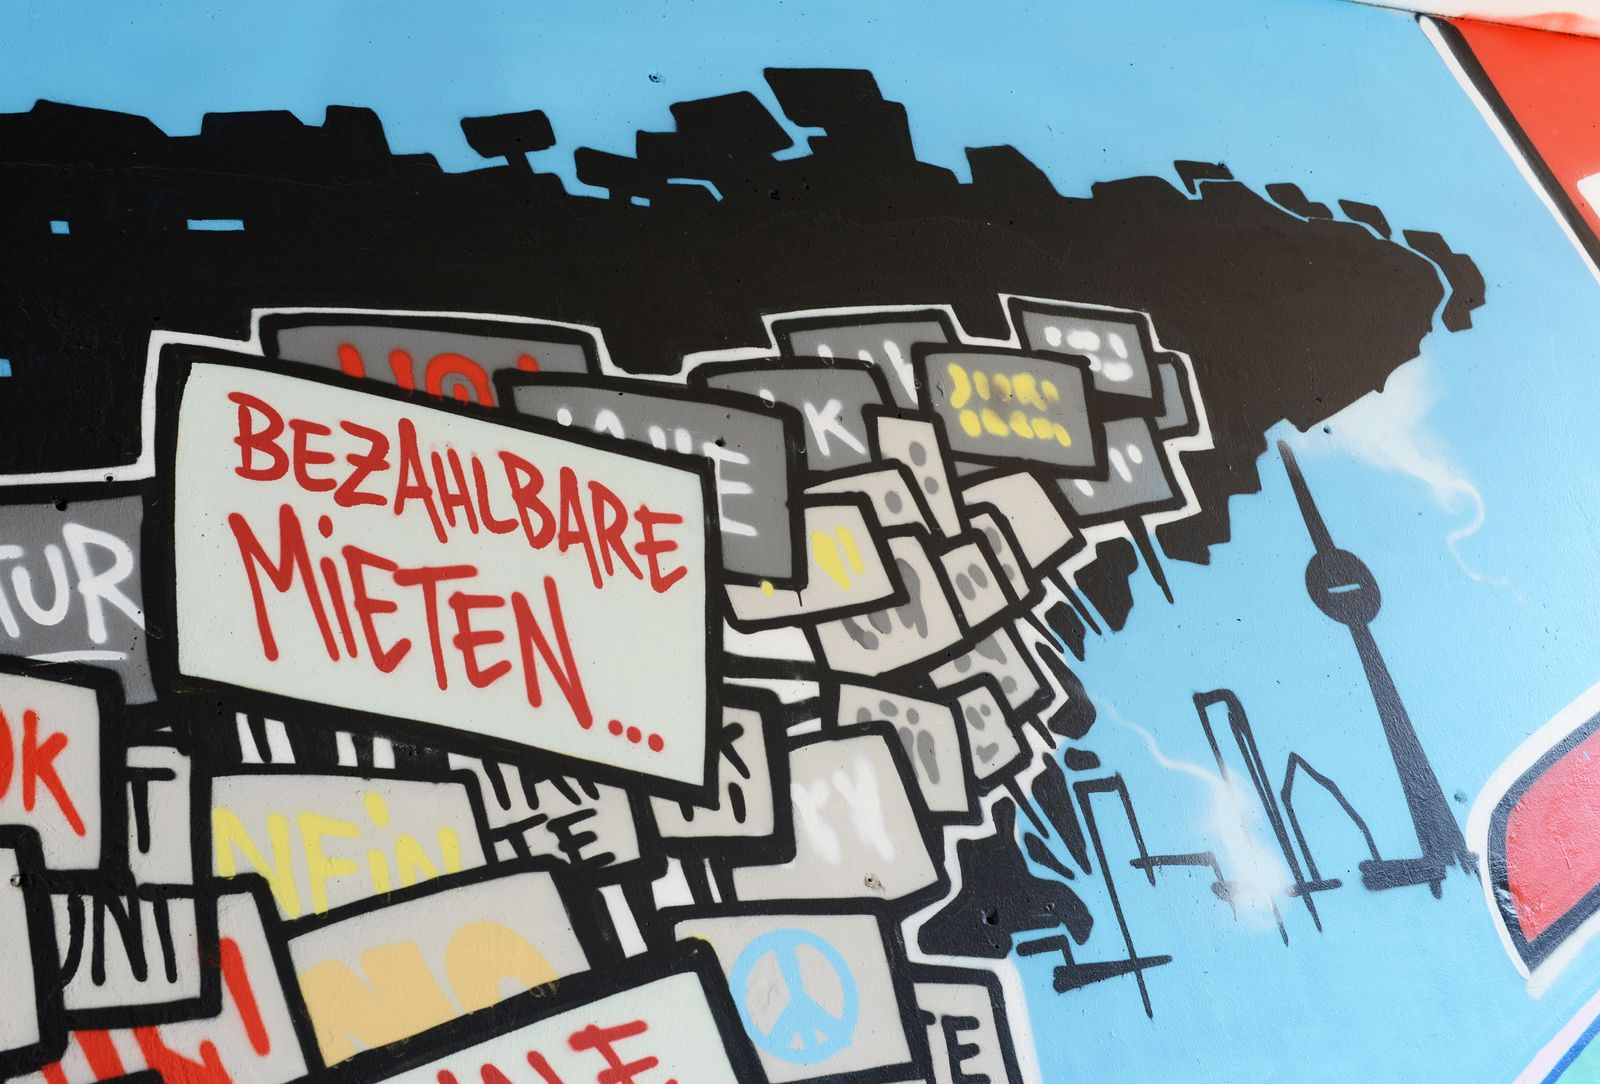 Mietpreise in Berlin